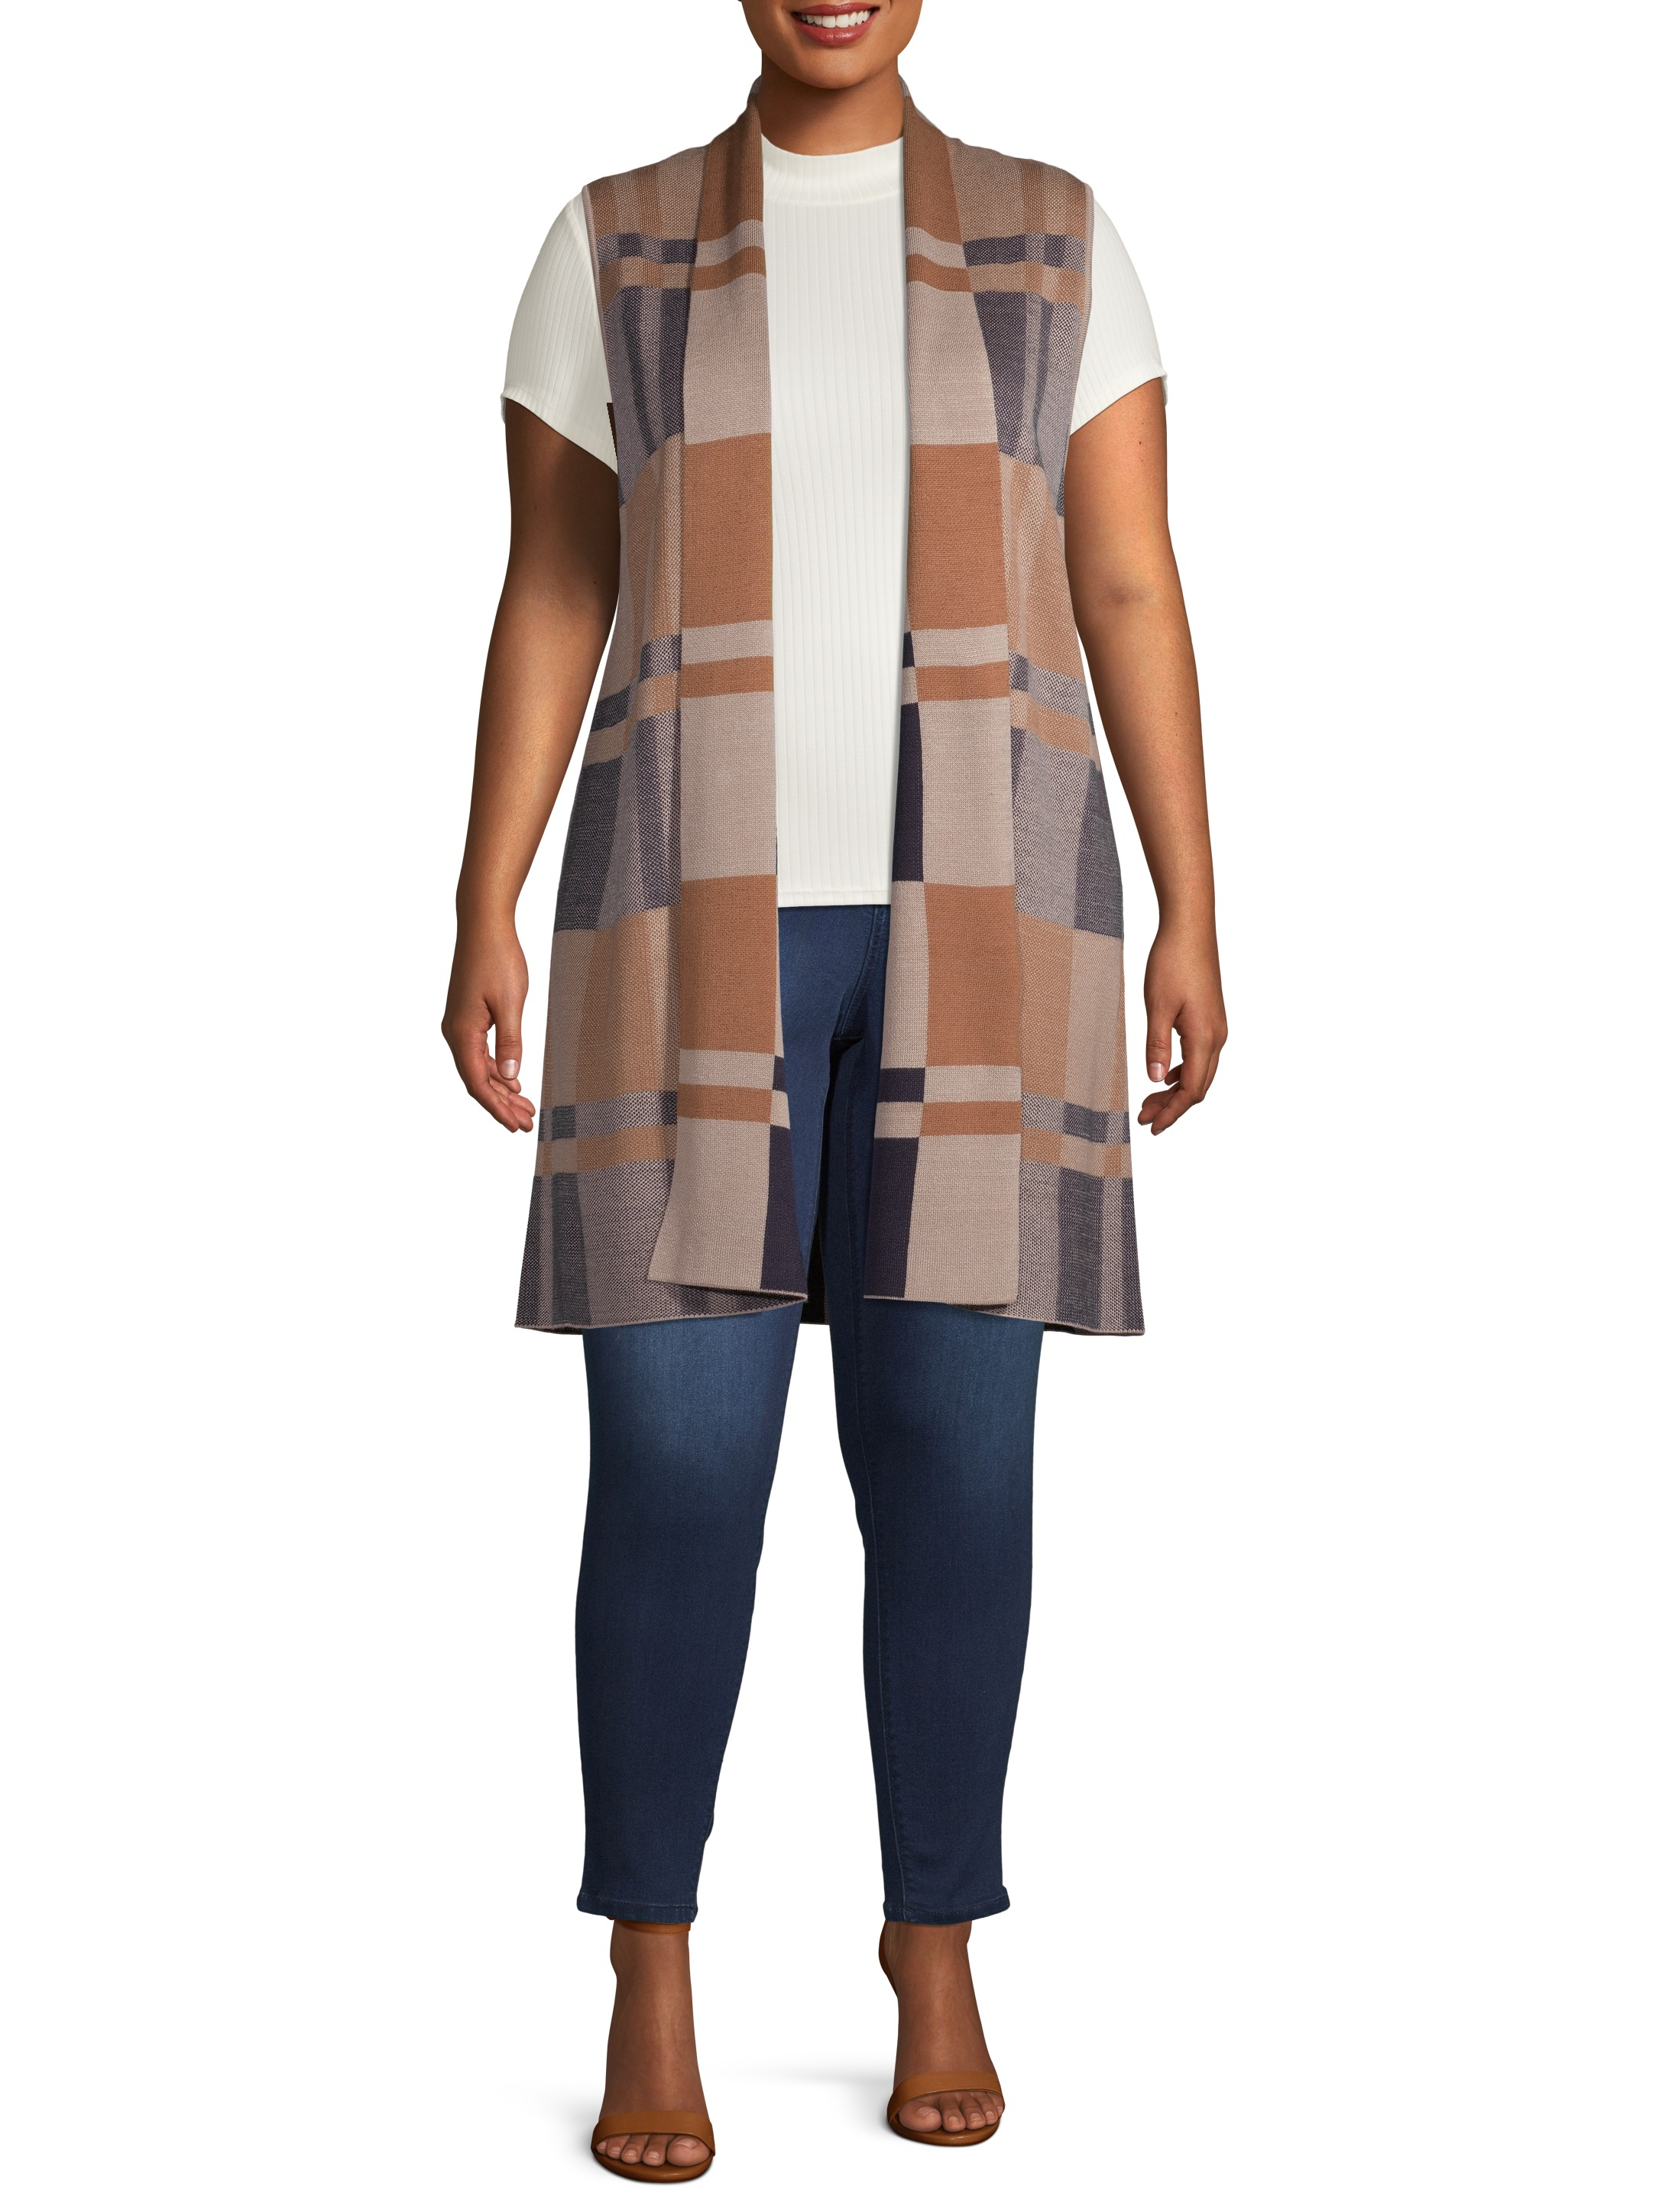 FULUE Ferret Vest Clothing,Ferret Accessories Kit Outfit Black